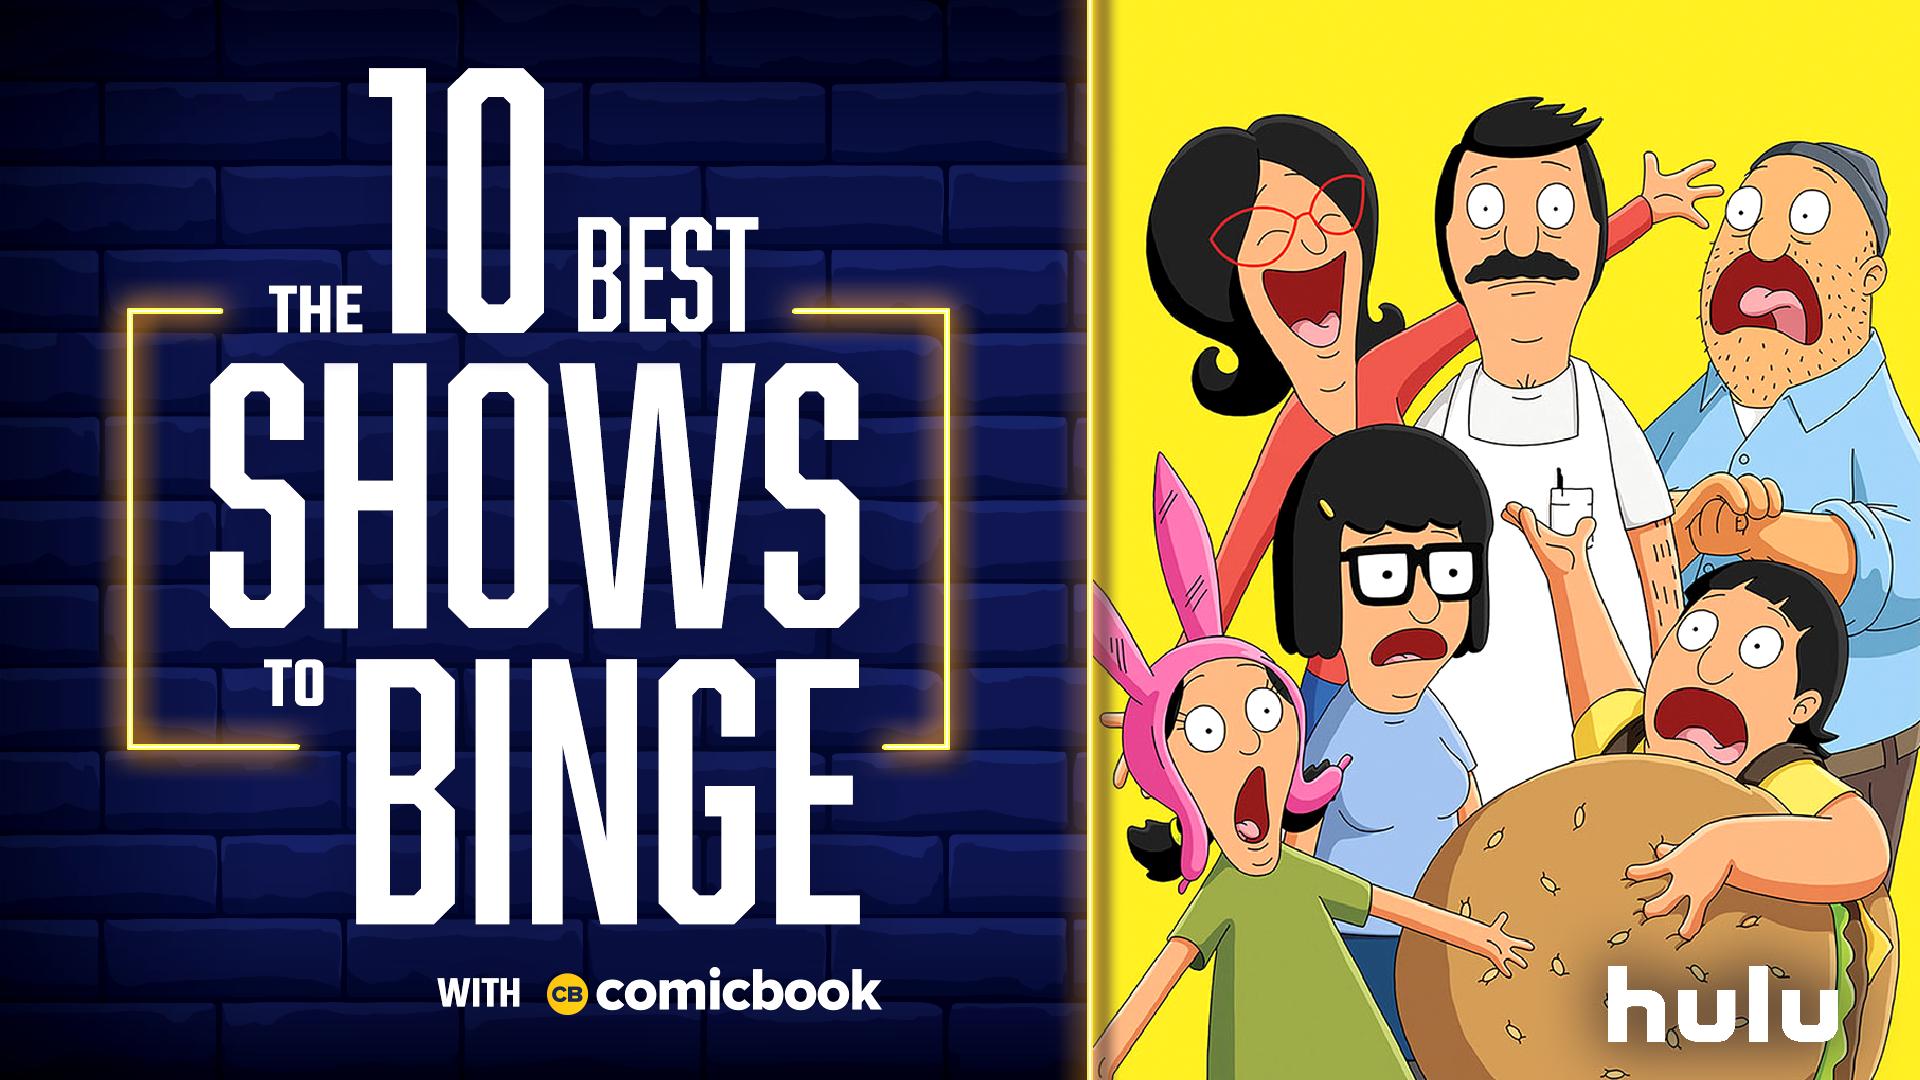 10 Best Shows to Binge on Hulu